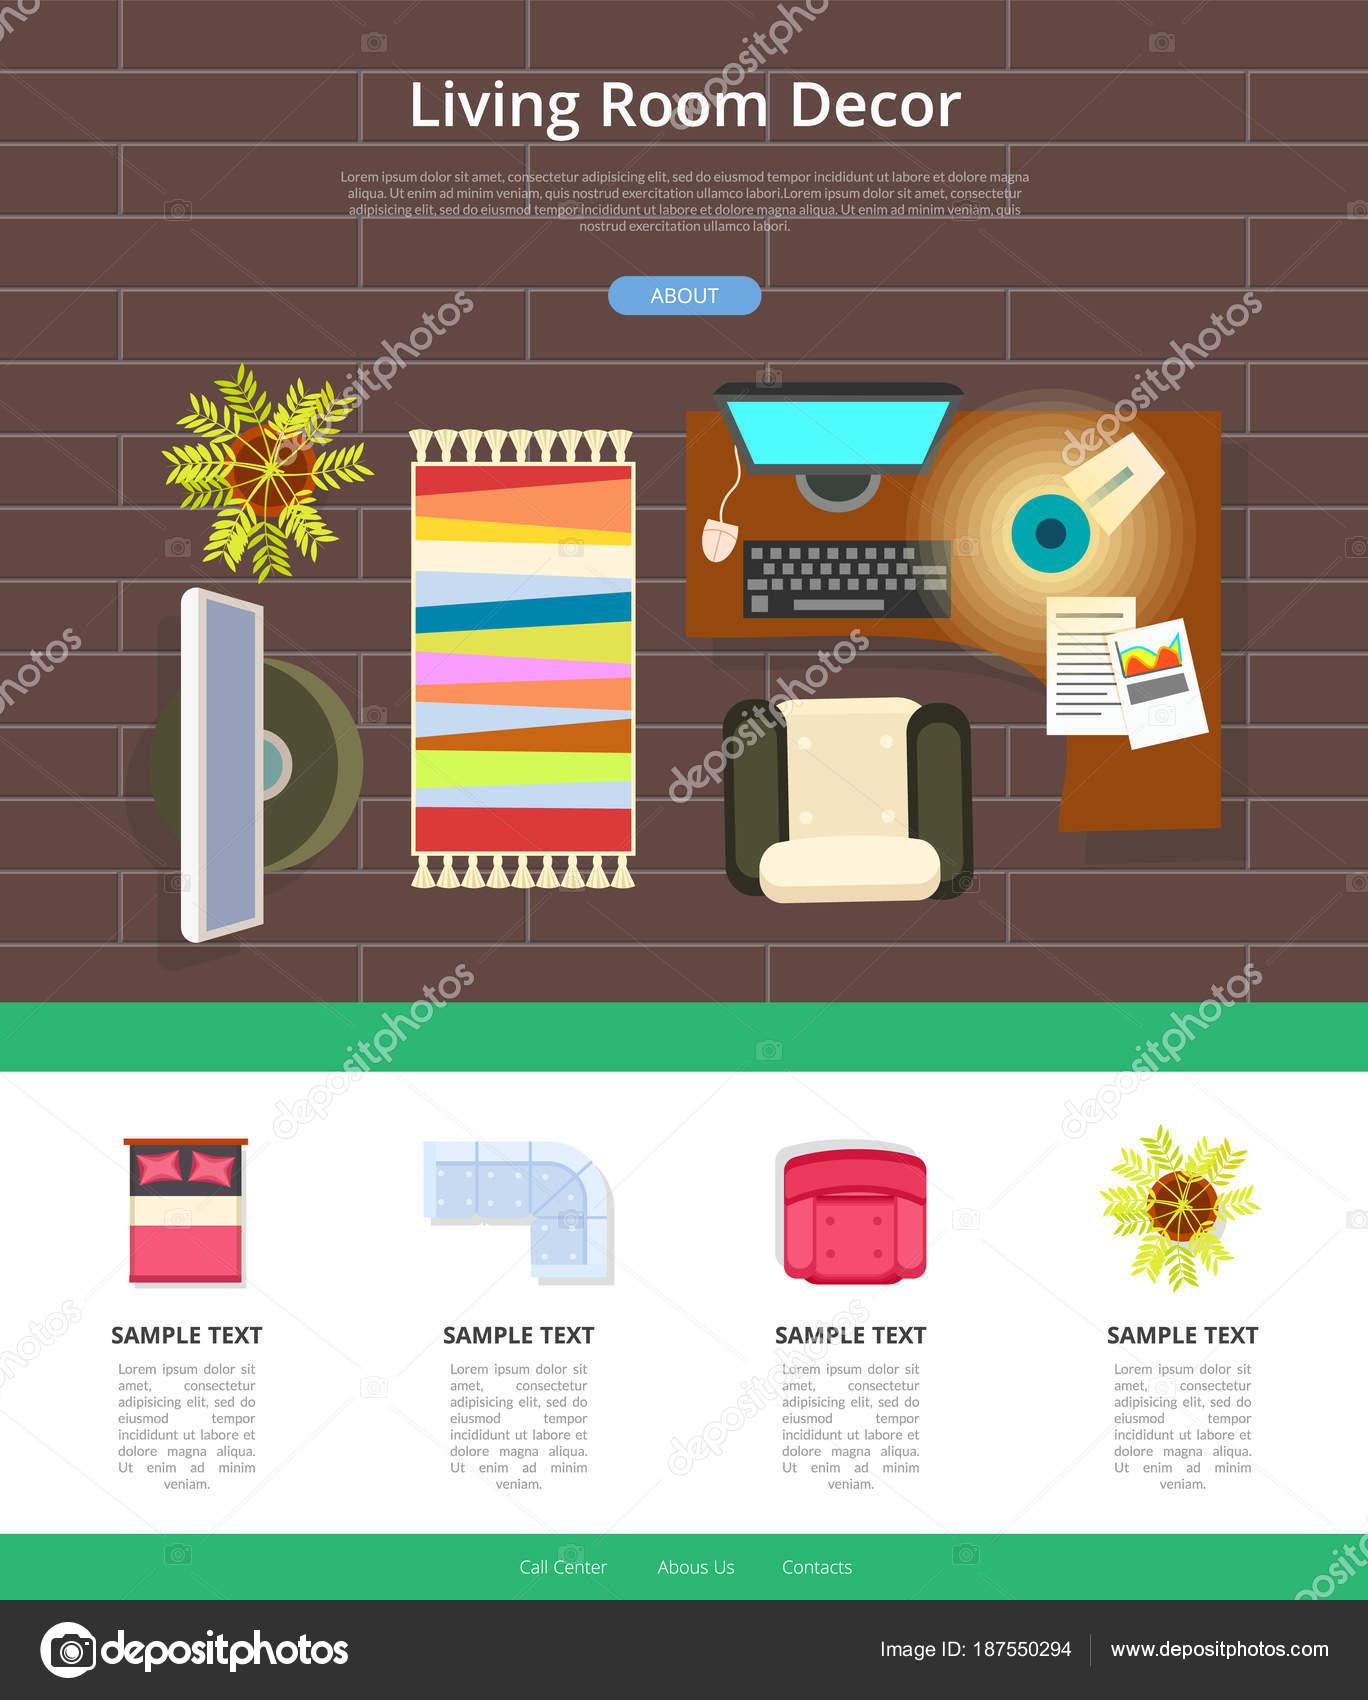 Living Room Decor Web Sample Vector Illustration Stock